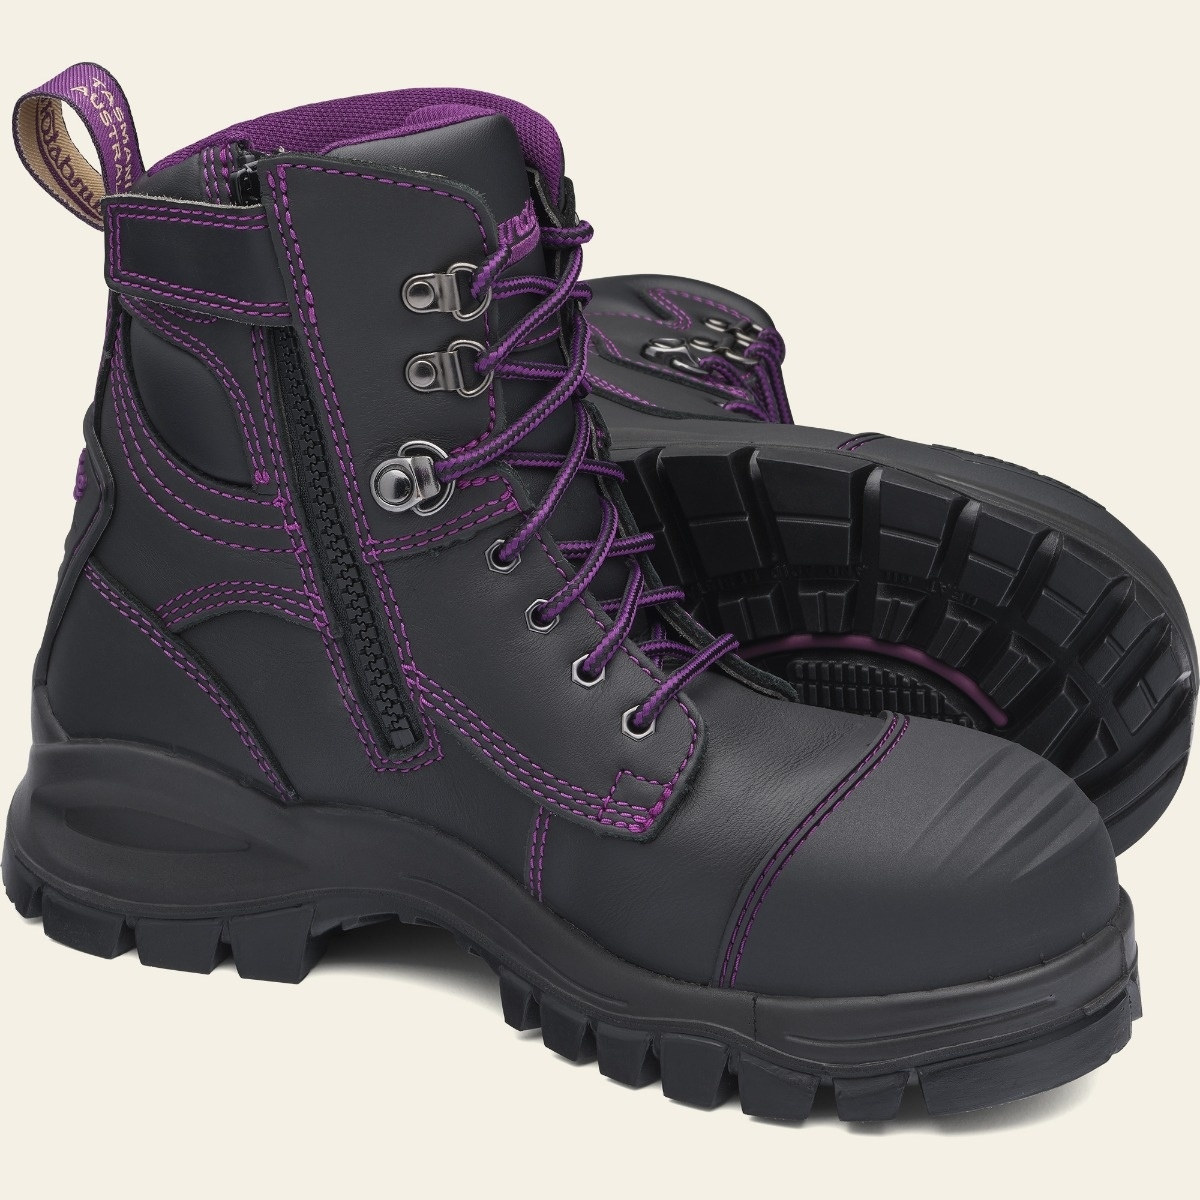 Black Premium Leather Work Boots, Women